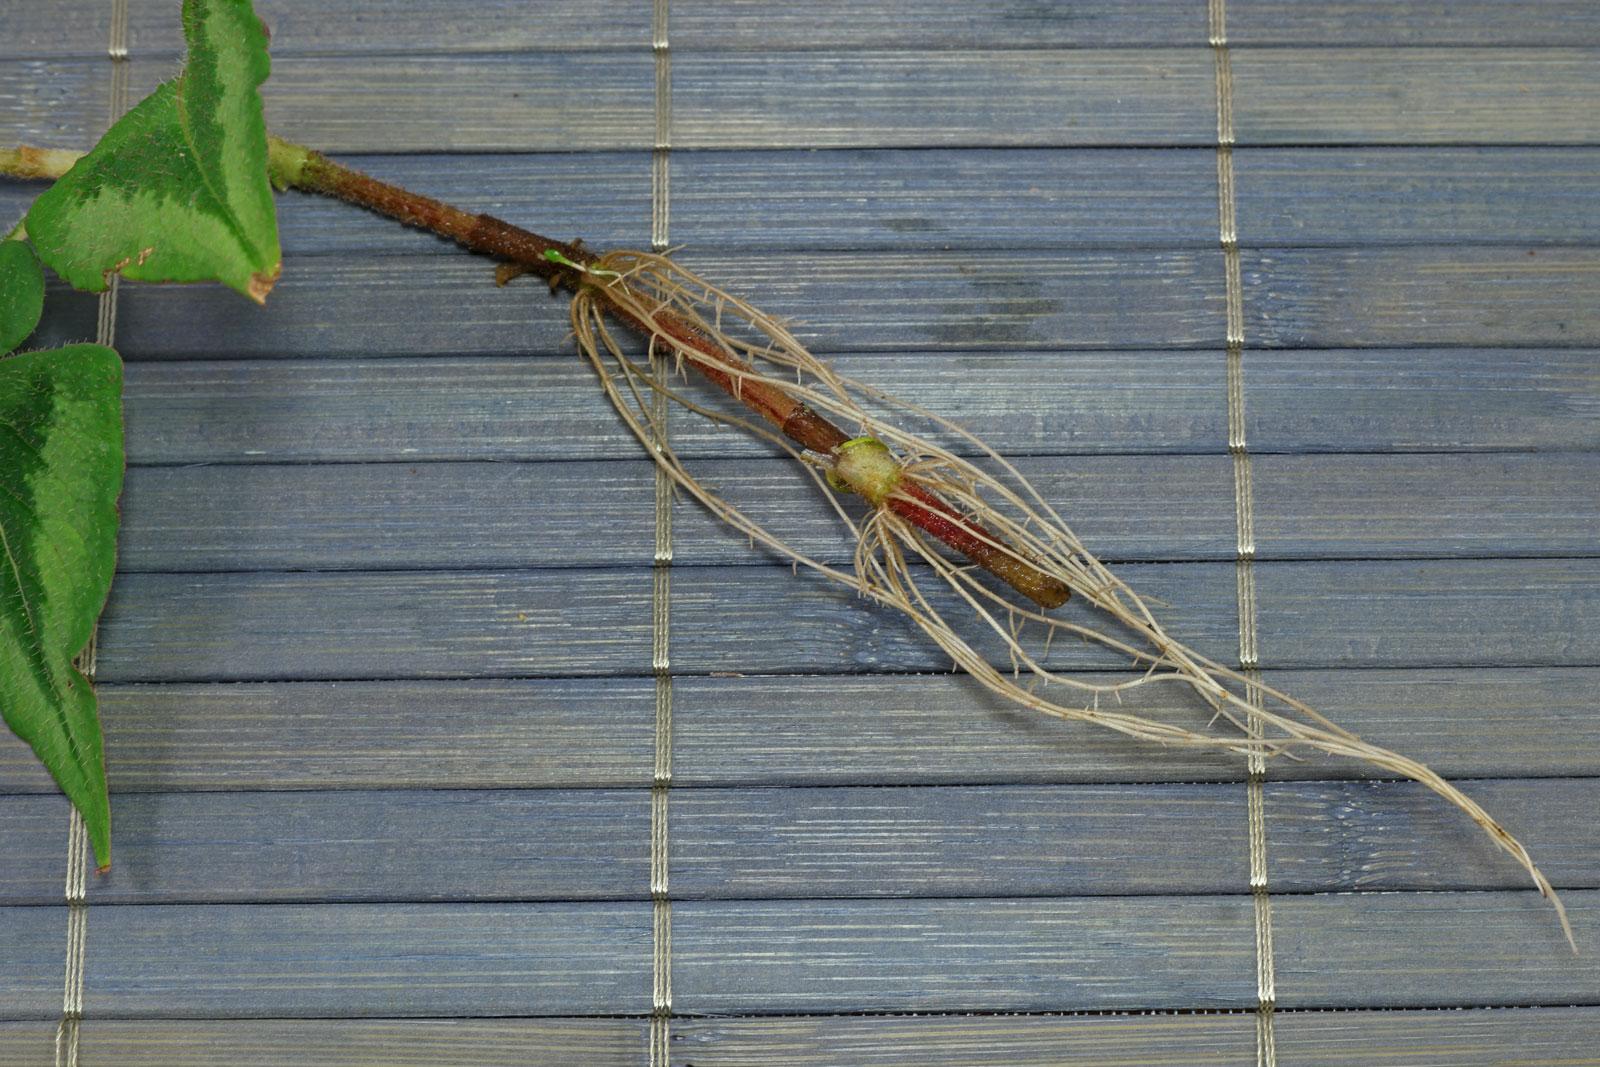 Persicaria microcephala